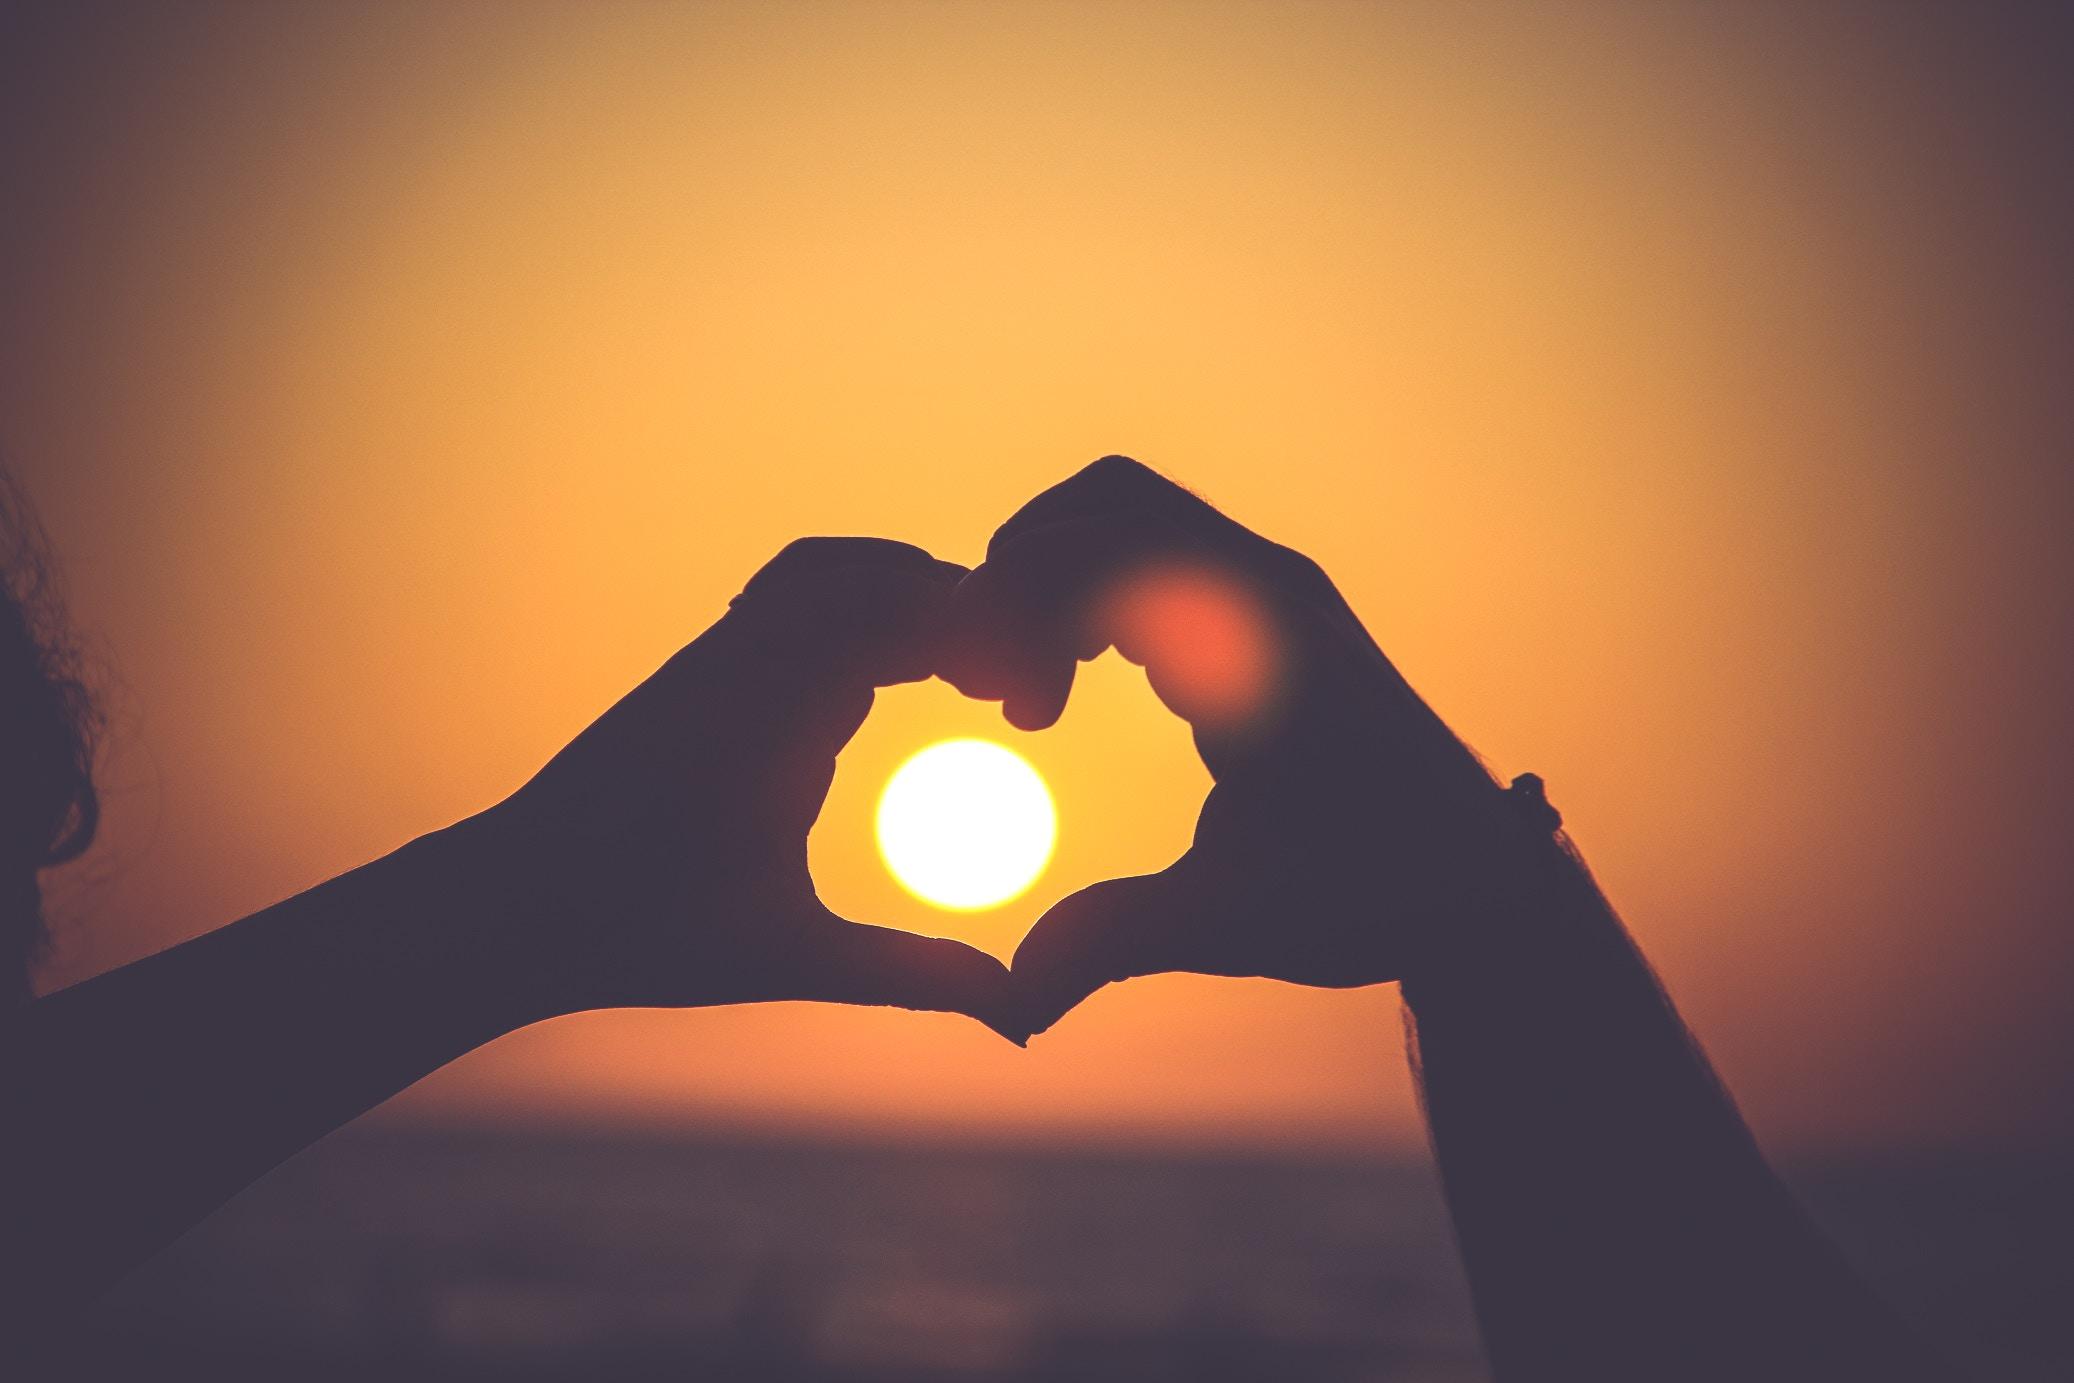 heart_hand.jpg